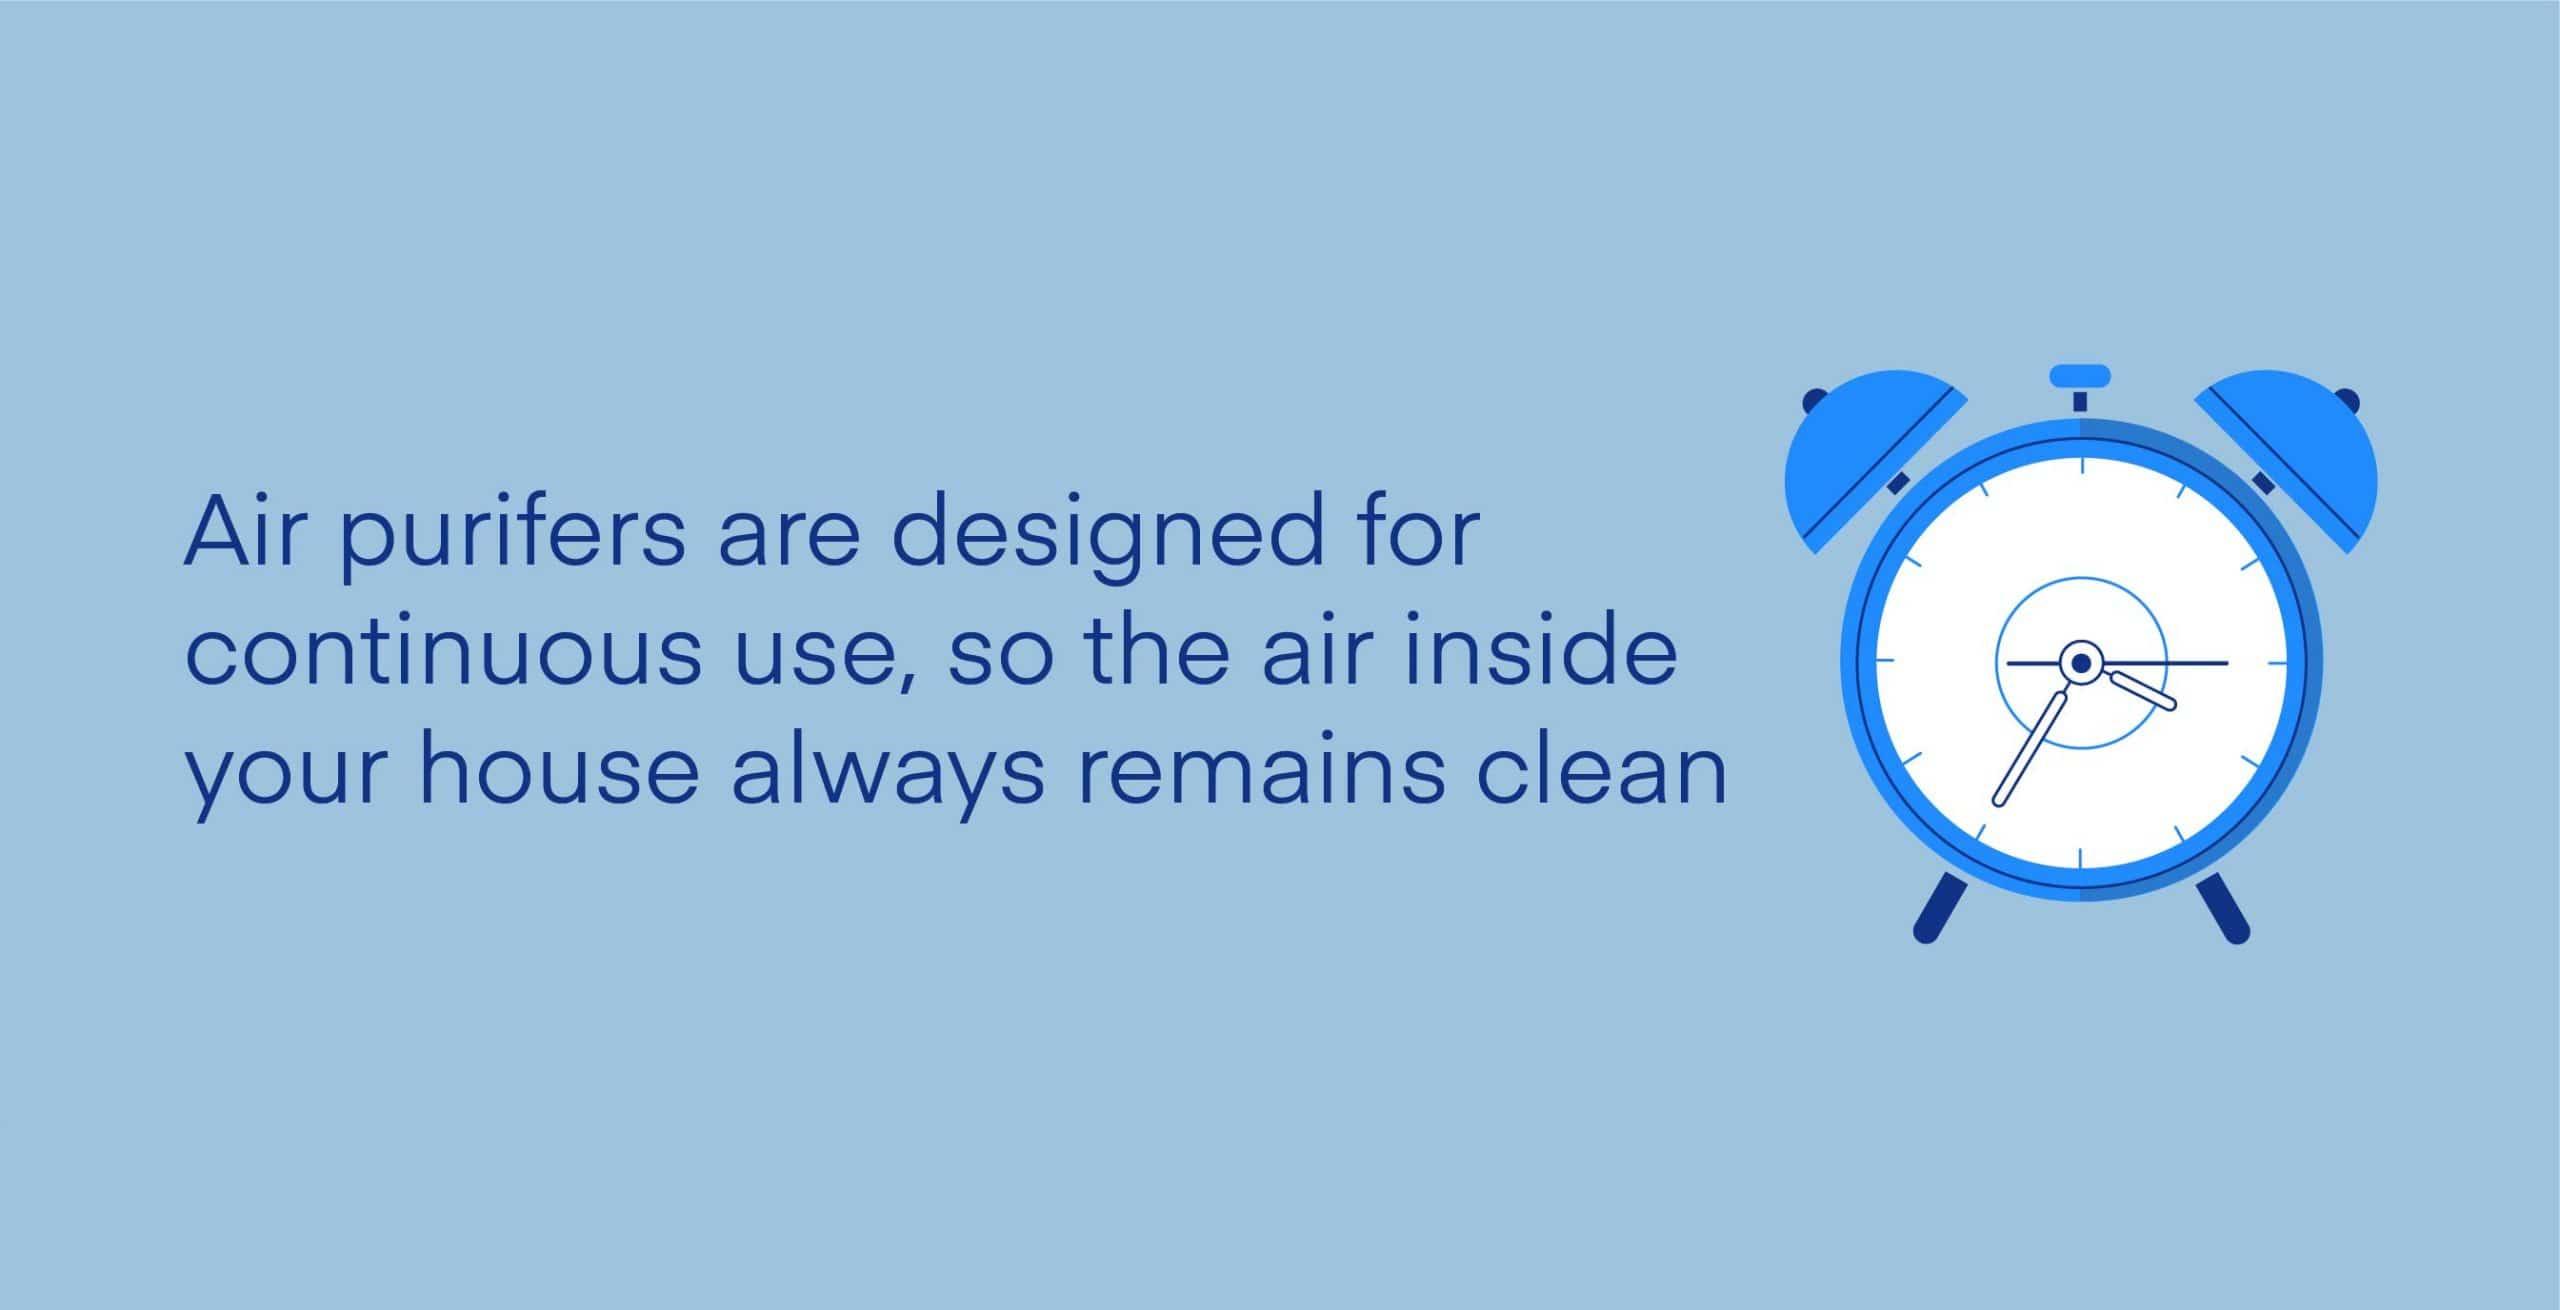 How Do Air Purifiers Work?